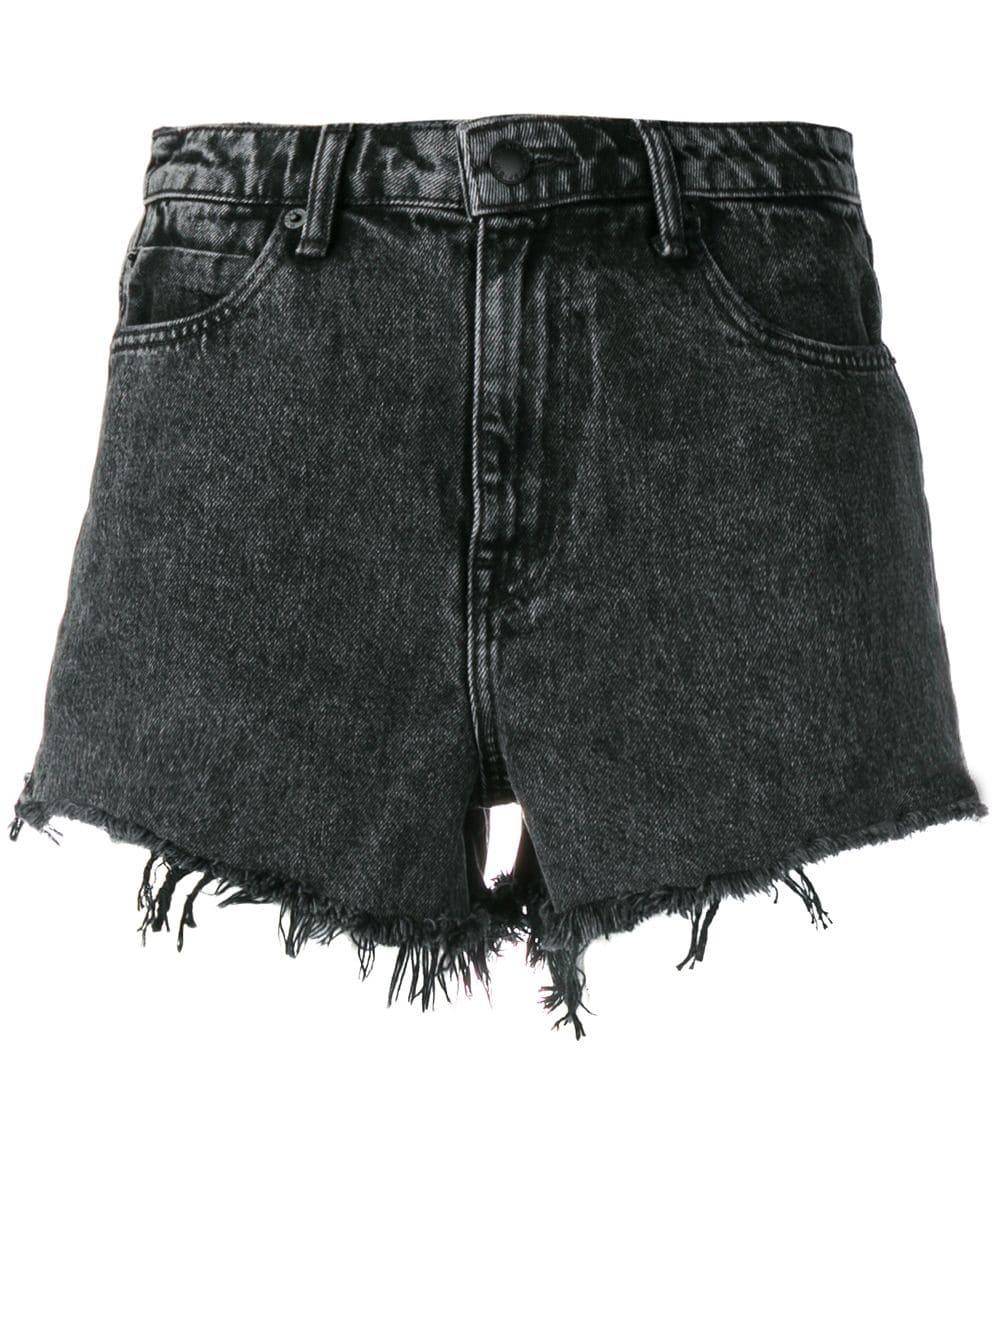 37b5da0f47 Alexander Wang Hybrid Bite Denim & Fleece Cutoff Shorts In Black ...